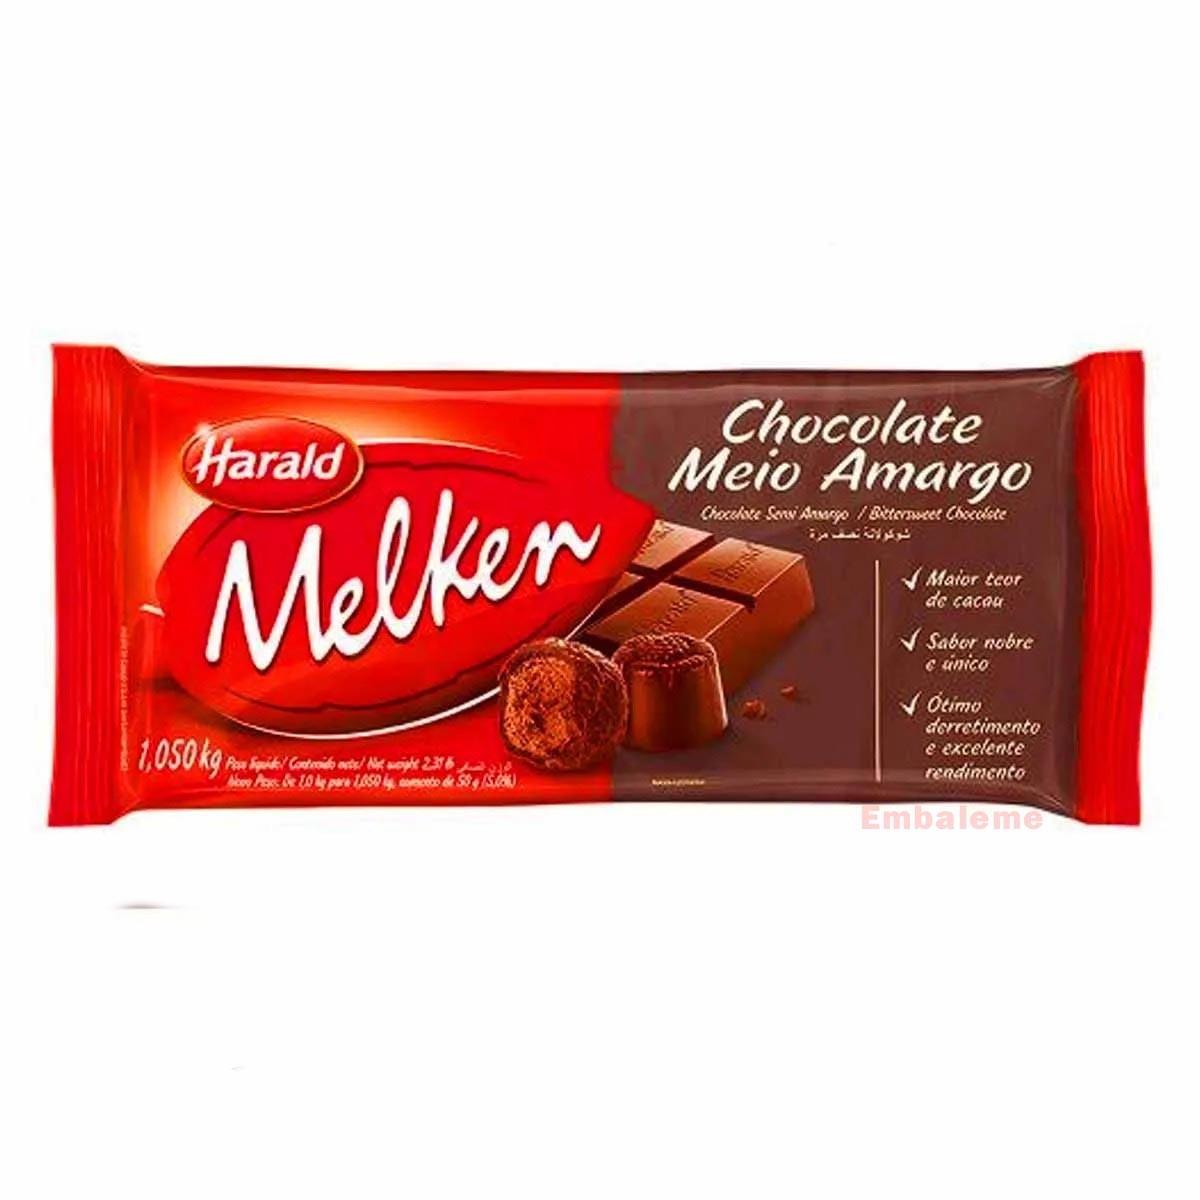 chocolate nobre meio amargo 1,05kg Melken Harald